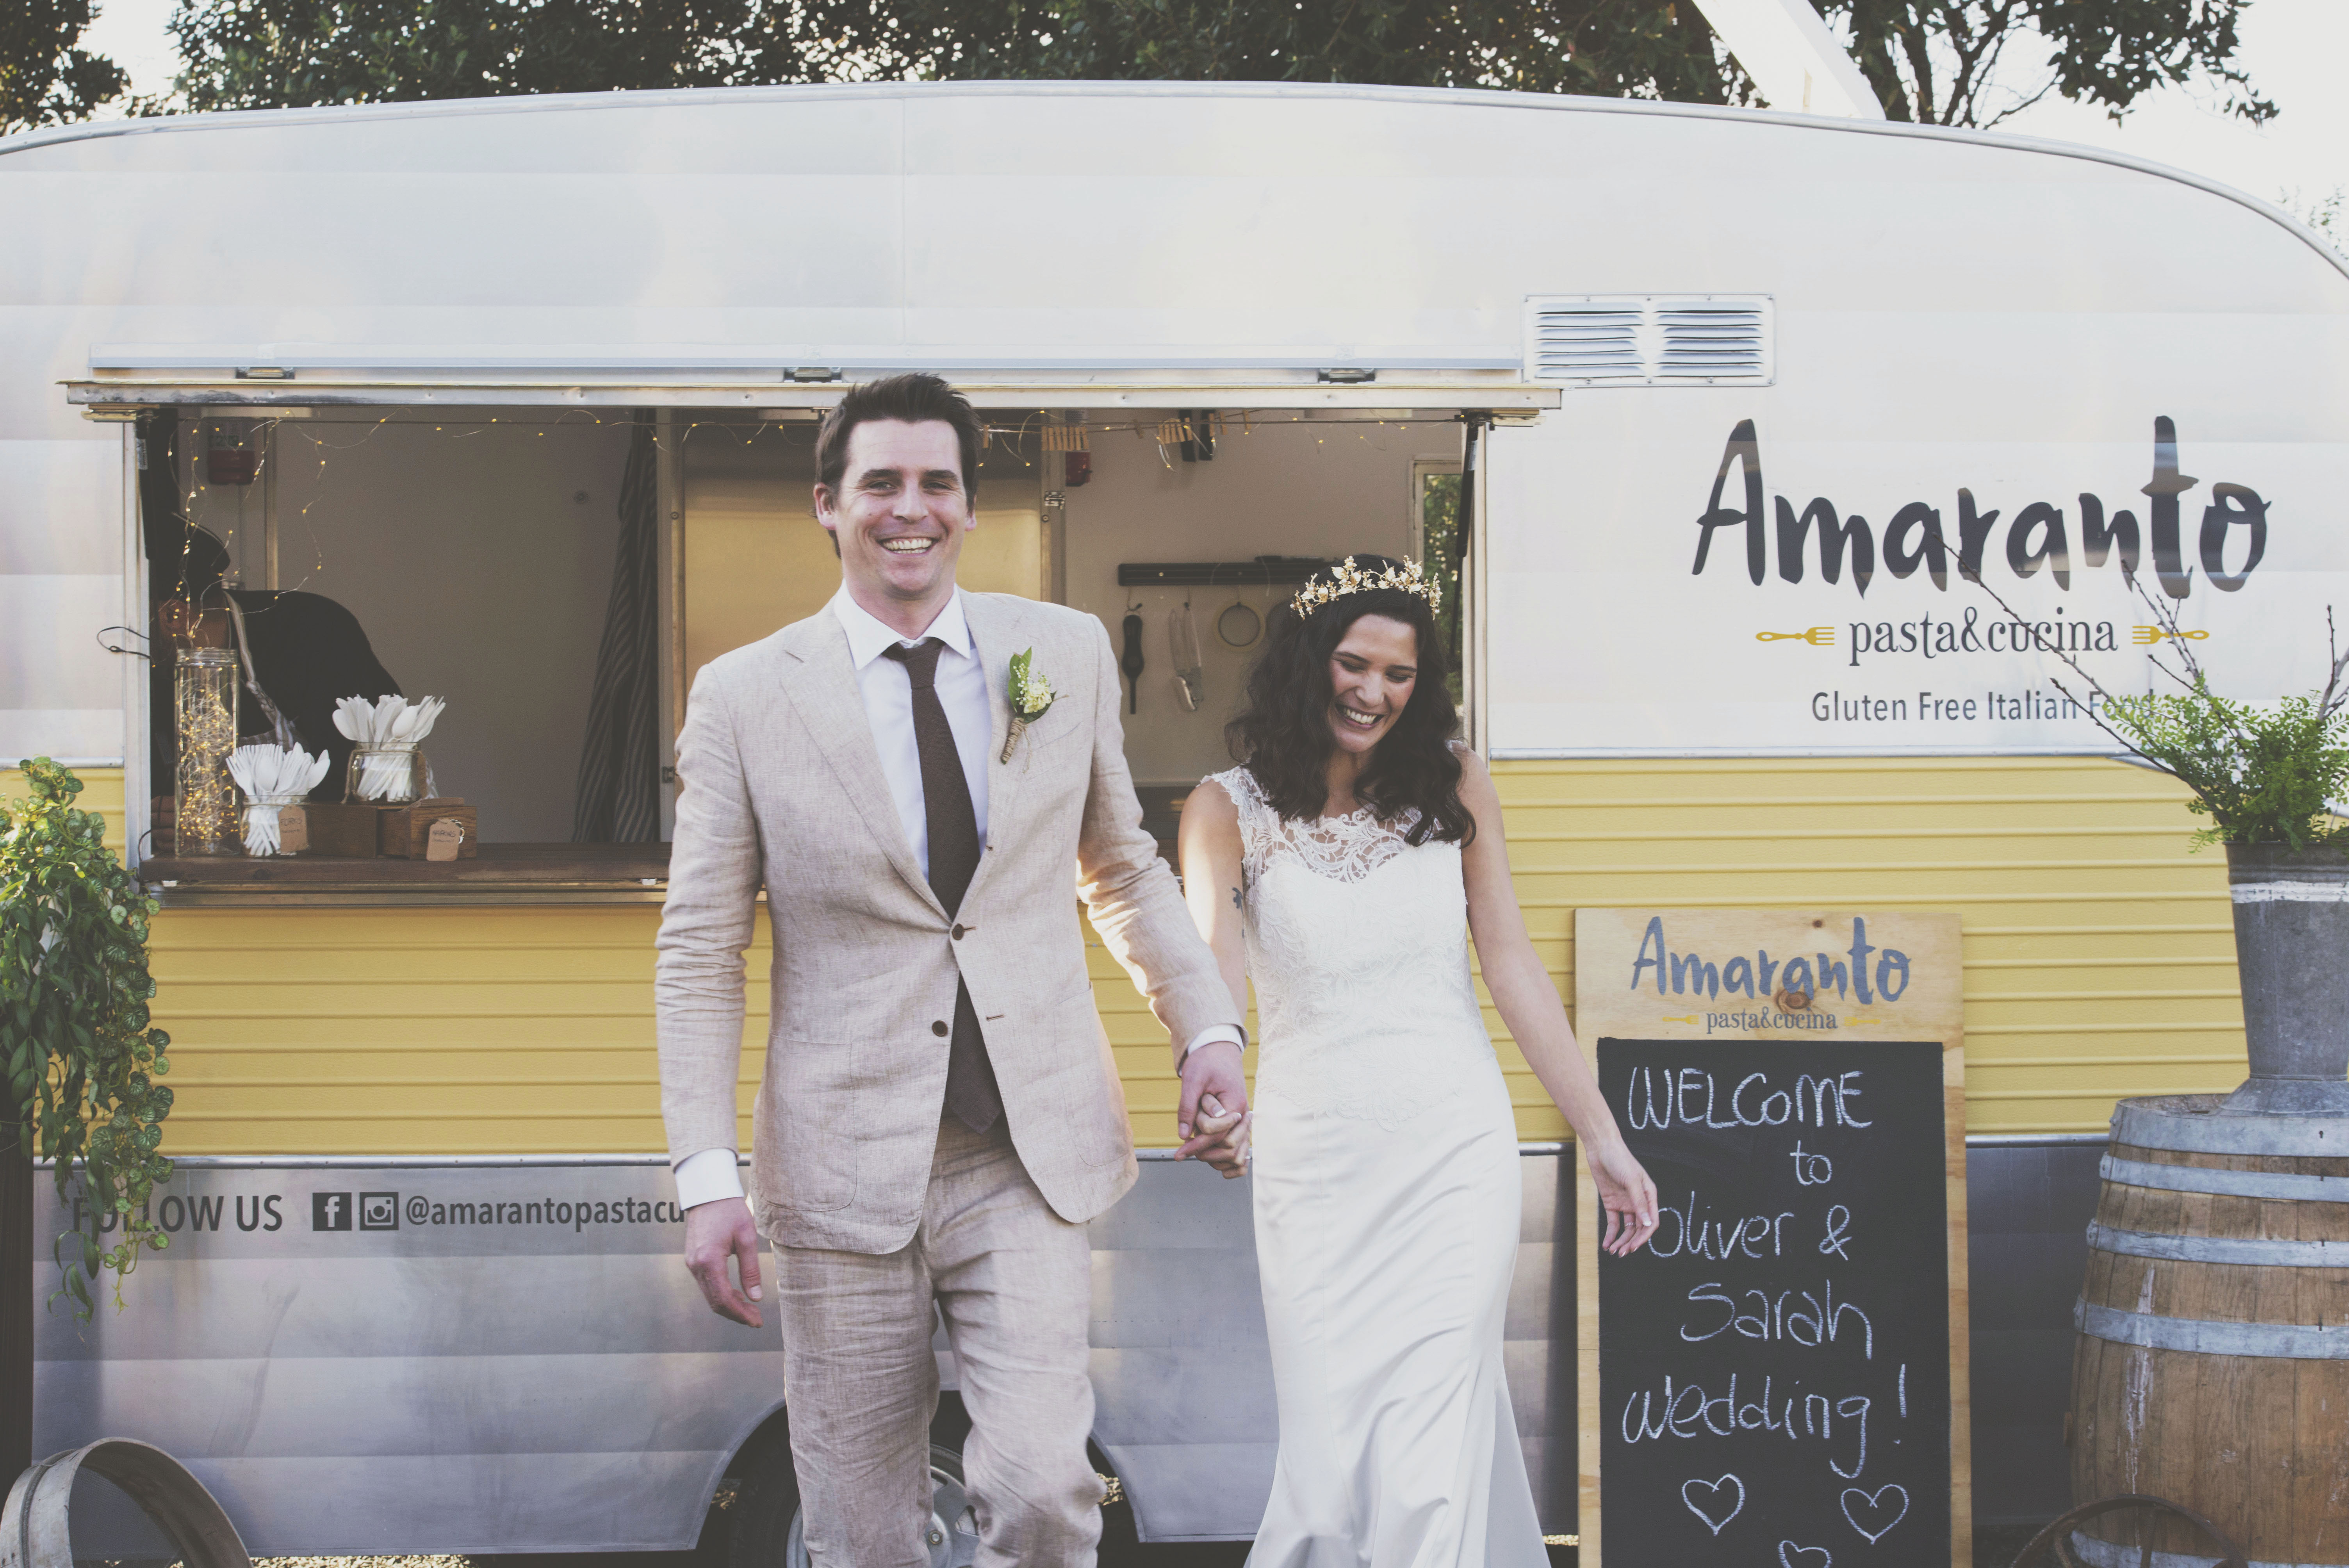 Italian Food Truck Auckland Amaranto